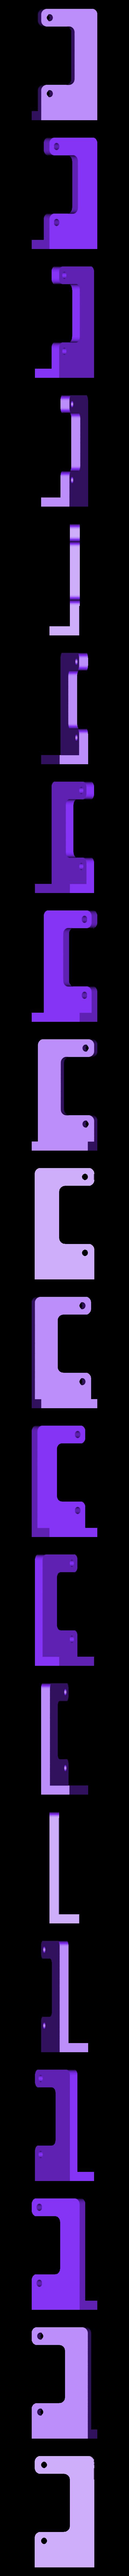 Table-SAW - fix-pwm-1.STL Download free STL file Table SAW • 3D print object, perinski